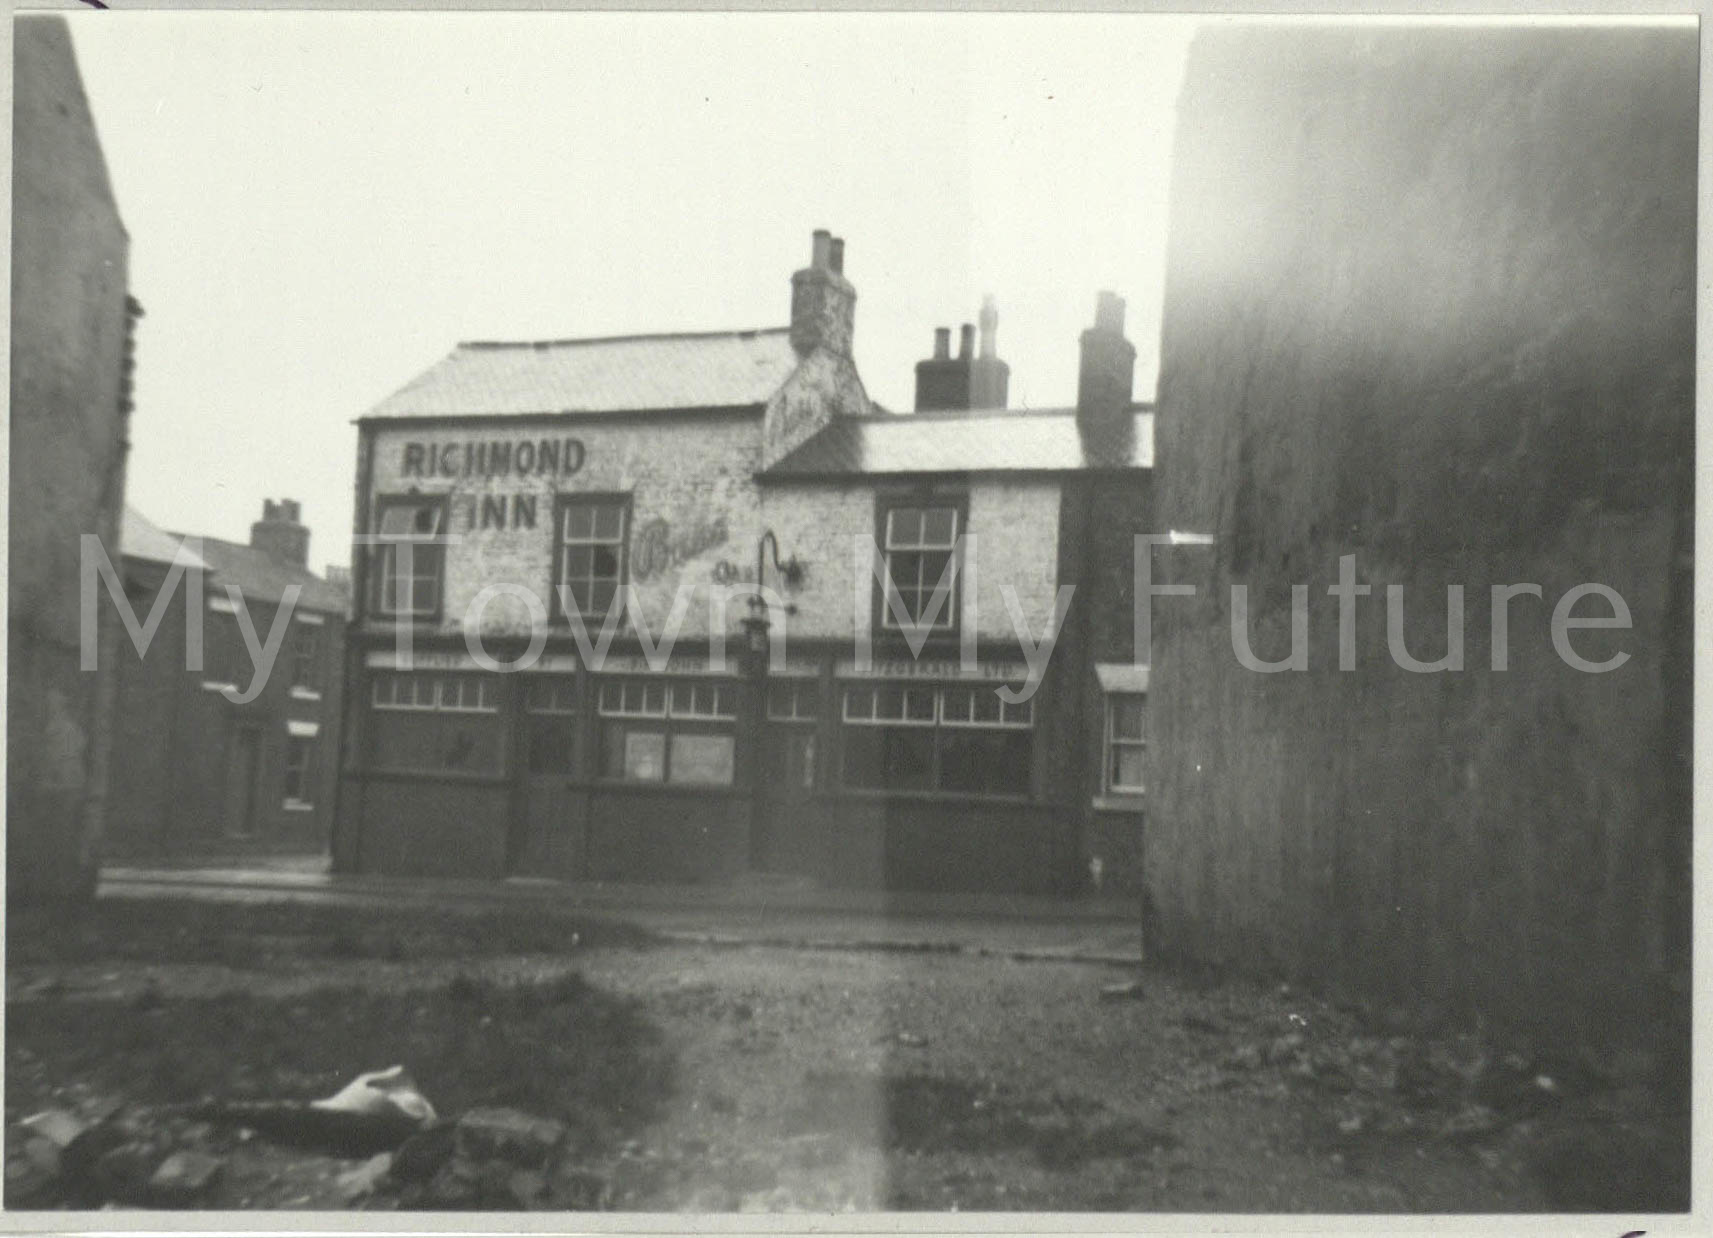 The Richmond Hotel - Richmond Street, Corner of John Street, 1959 - Paul Stephenson